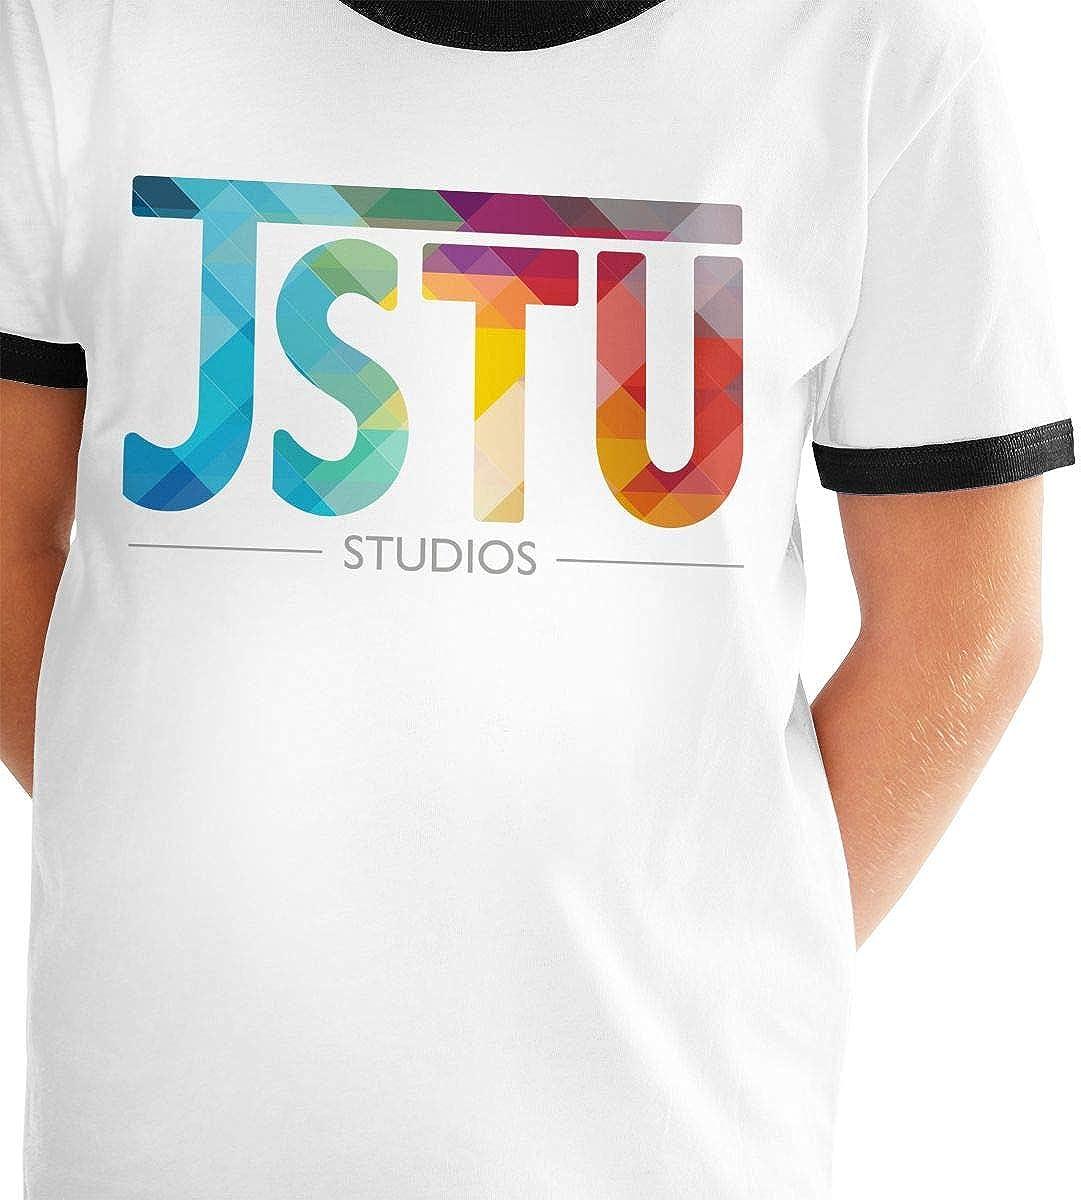 dreamering MoreJStu Teenager Junior Boys Girls Youth Short Sleeve T Shirt Tee Contrast Shirts